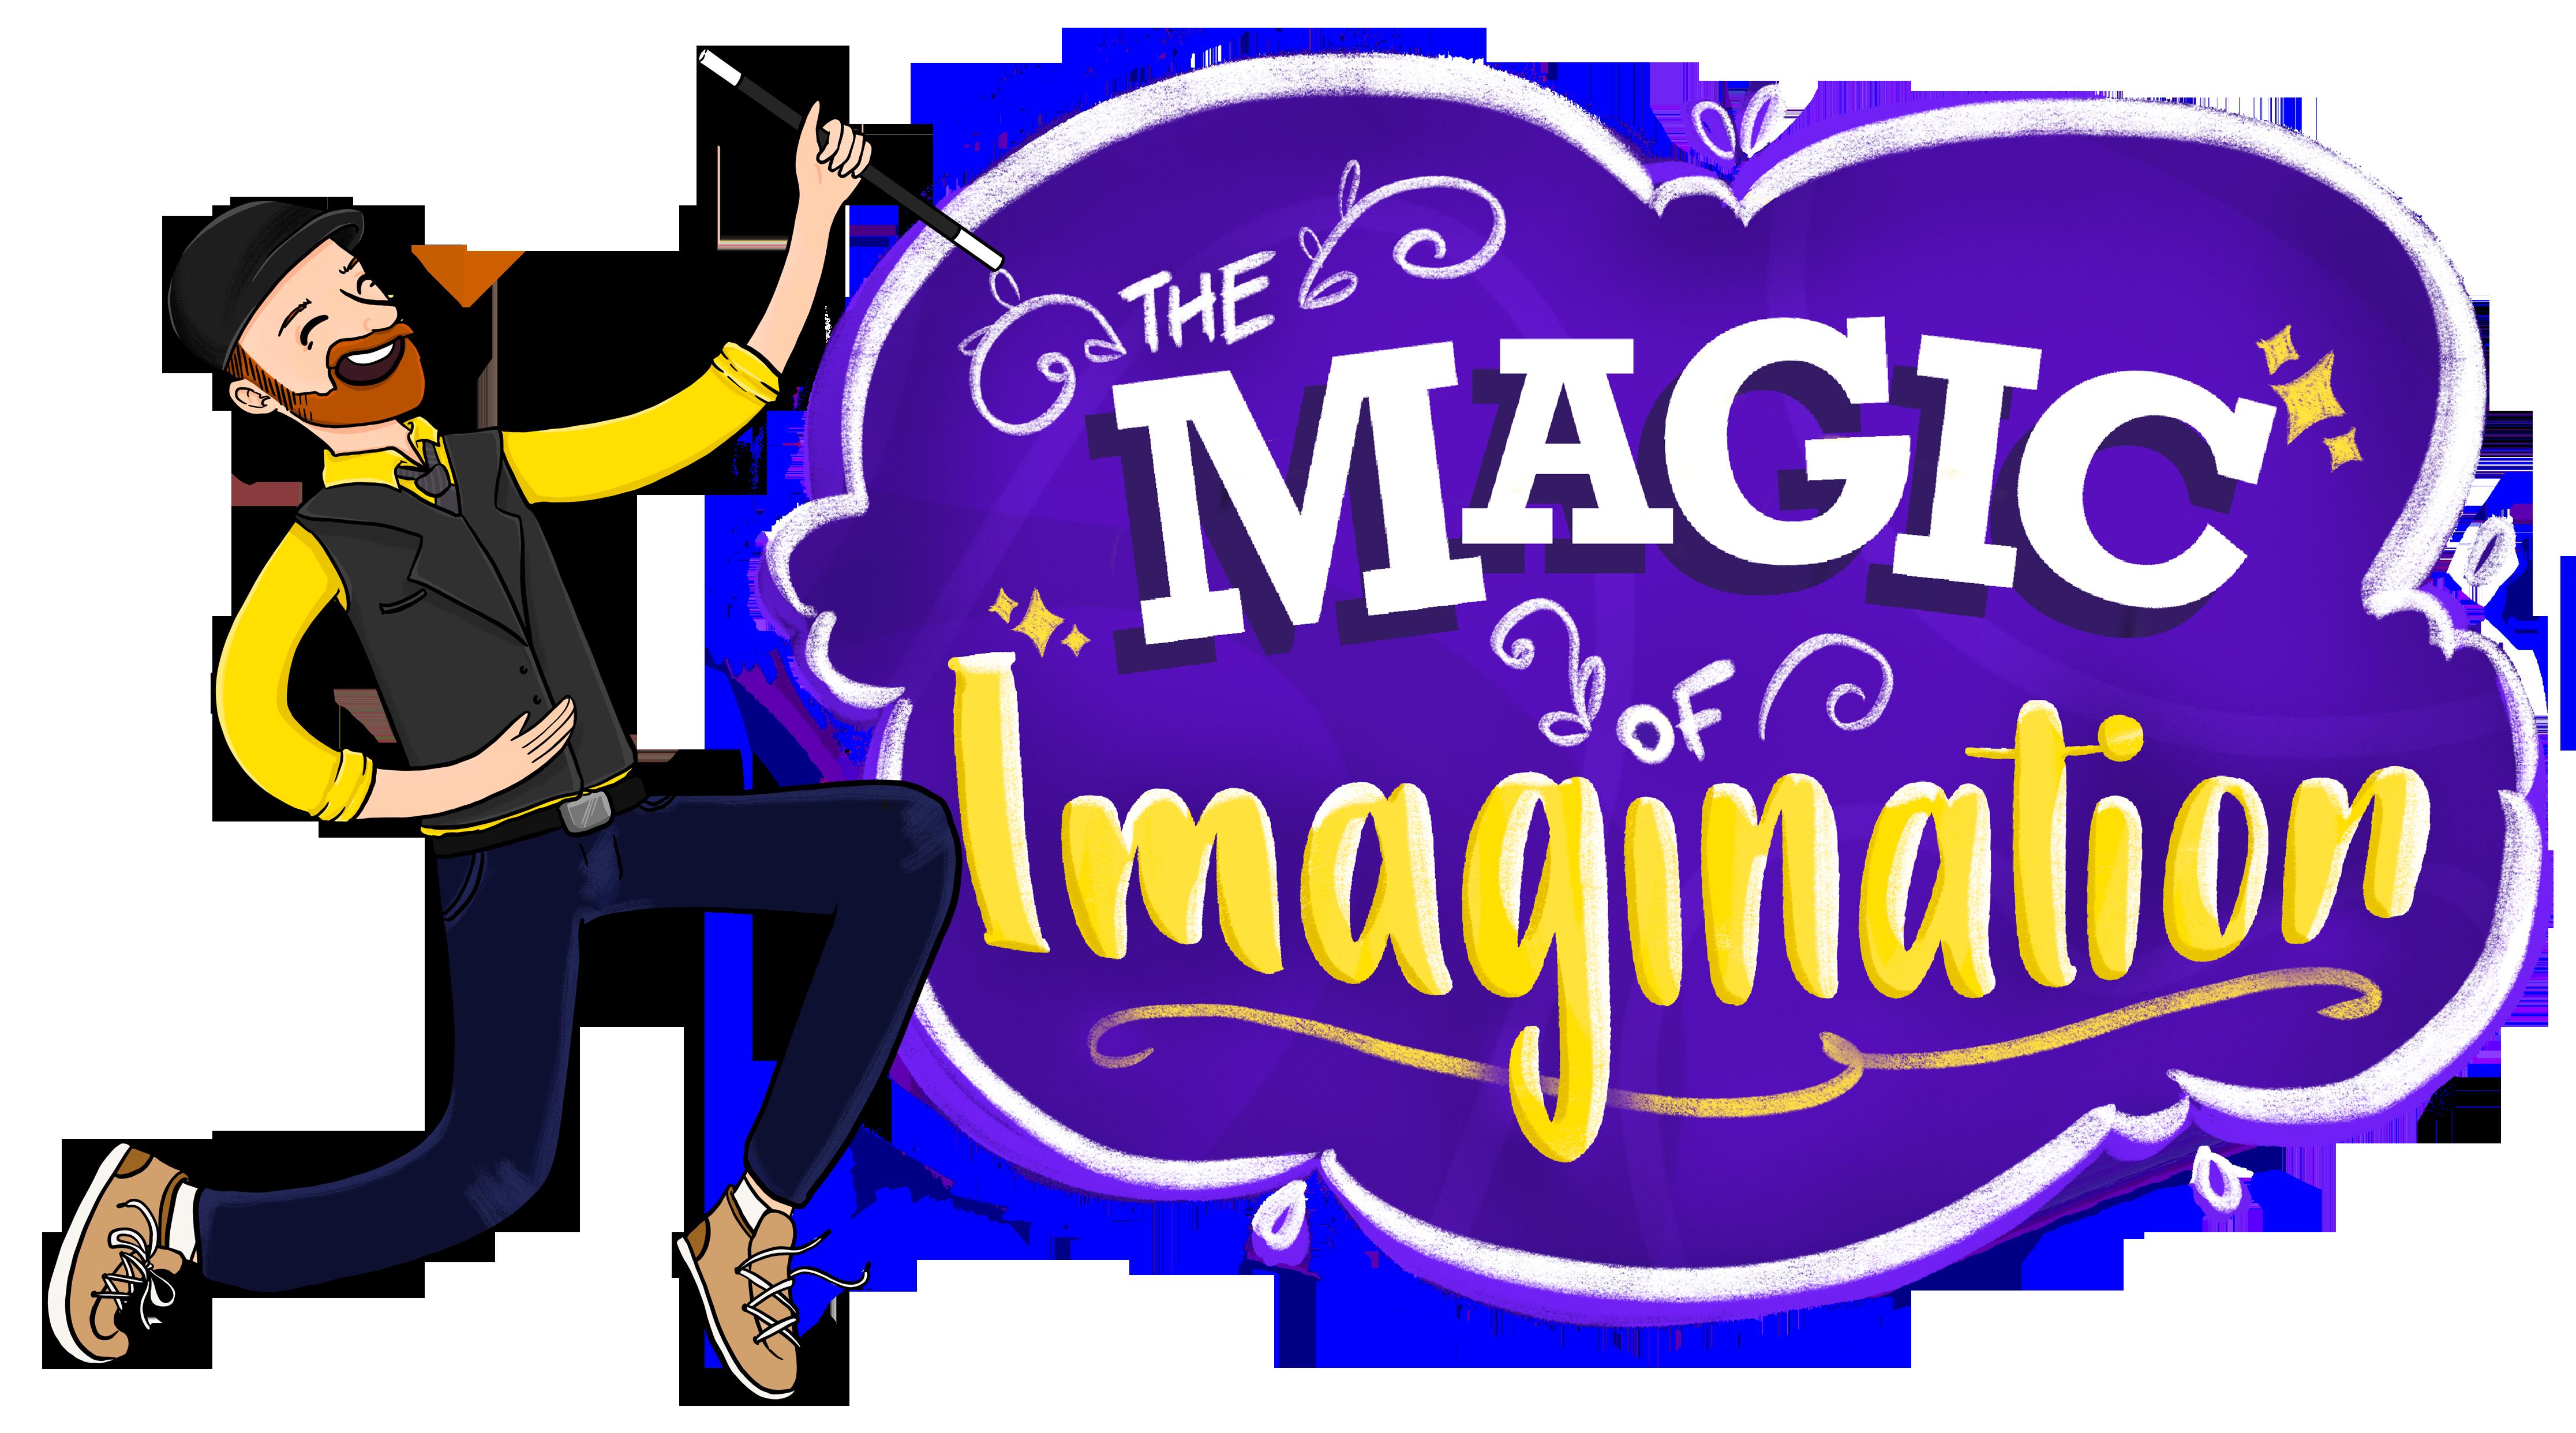 Image of Daniel Lusk's logo - The Magic of Imagination